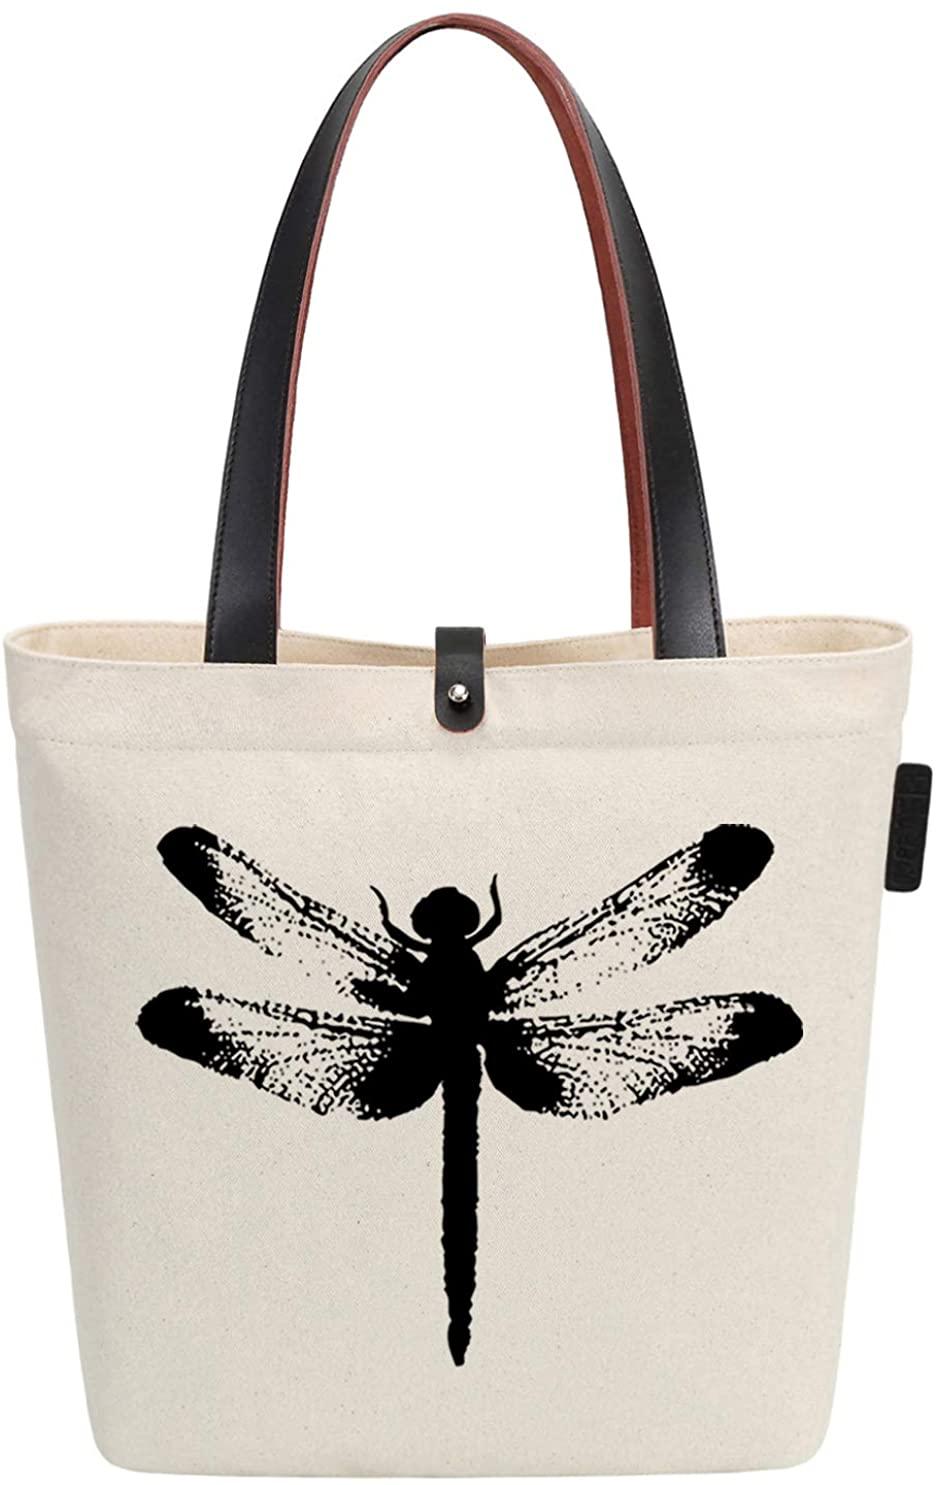 So'each Canvas & Beach Tote Bag Dragonfly Animal Graphic Handbag Shoulder Bag